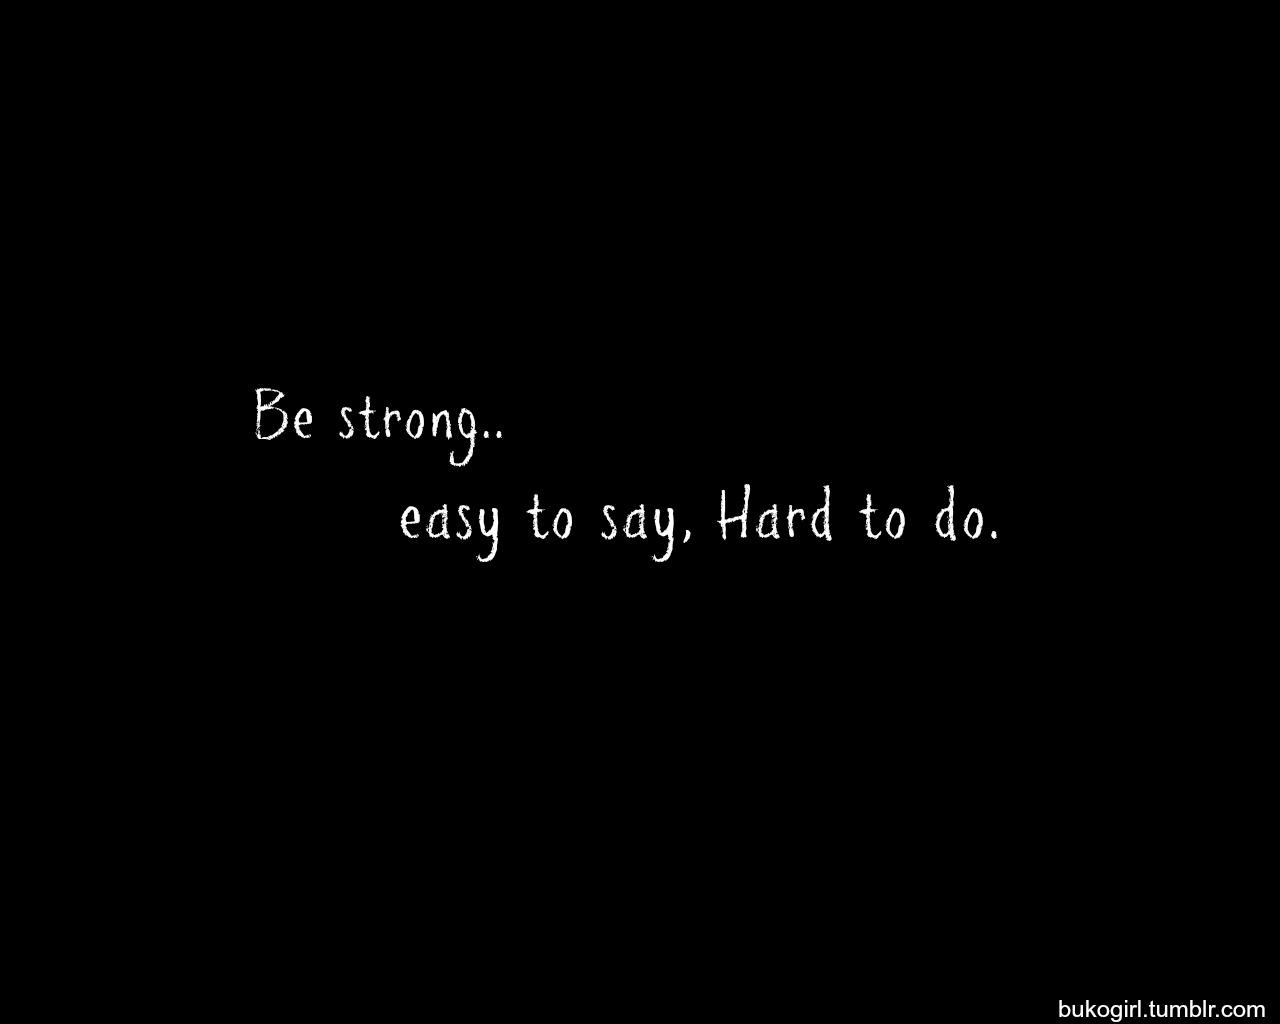 Heart Broken Quotes Tumblr: Heartbroken Quotes. QuotesGram